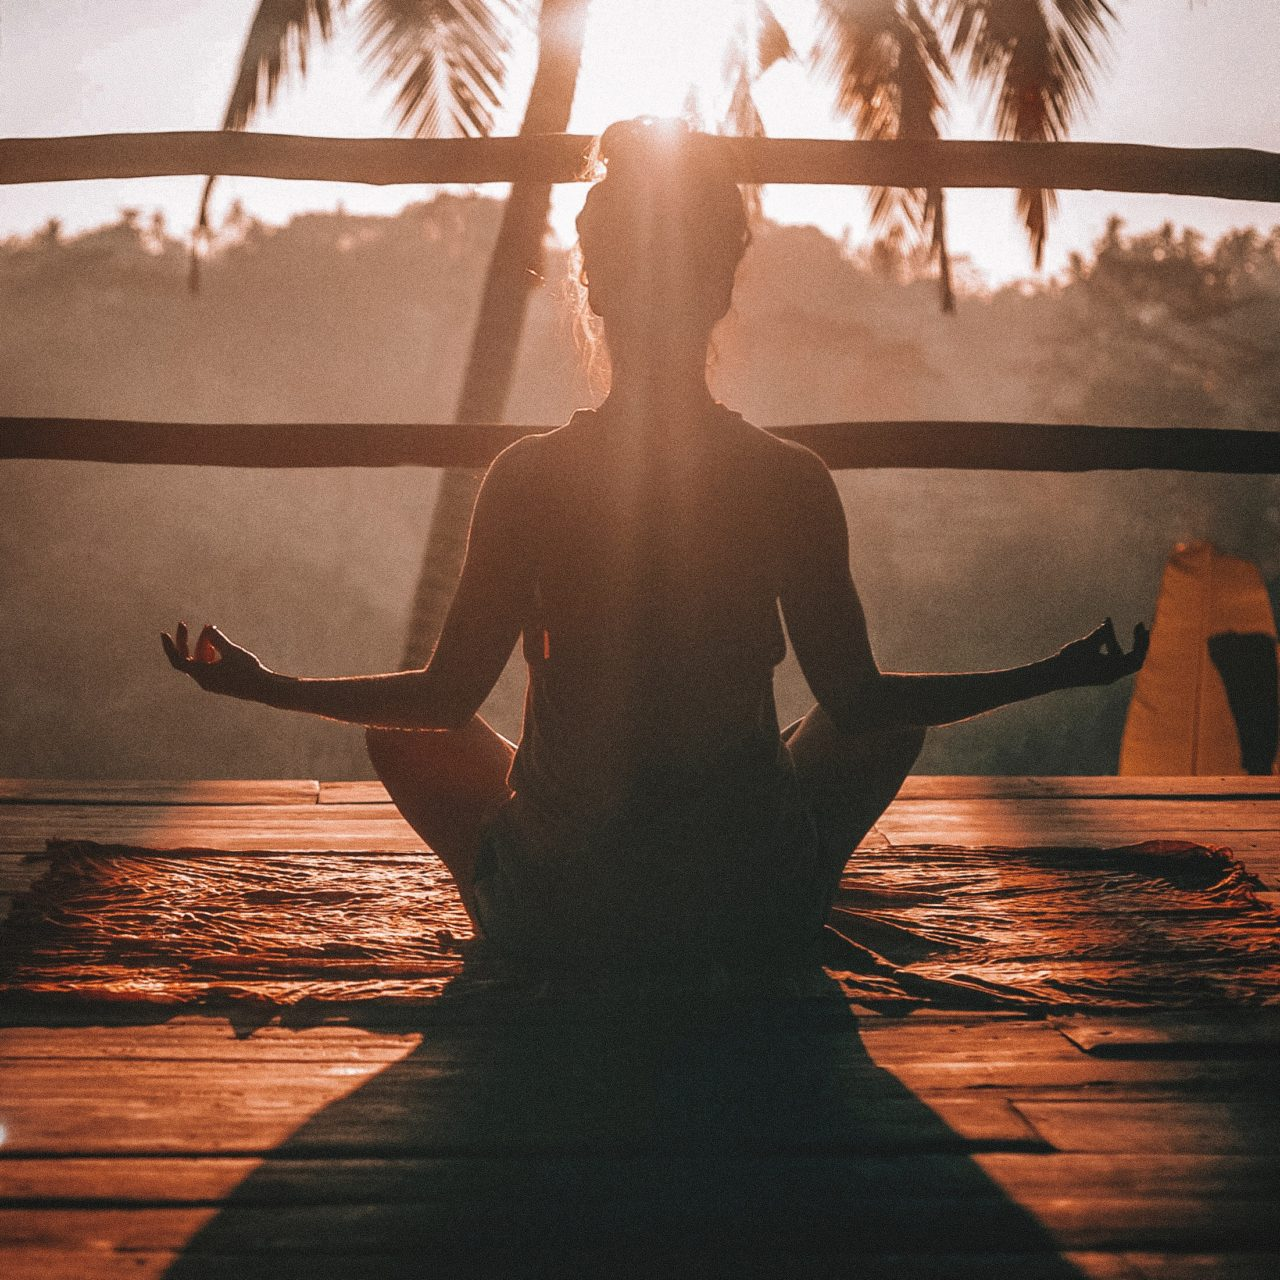 https://www.elevatehwc.com/wp-content/uploads/2018/09/yoga-pose-in-sunset-unsplash-1-1280x1280.jpg